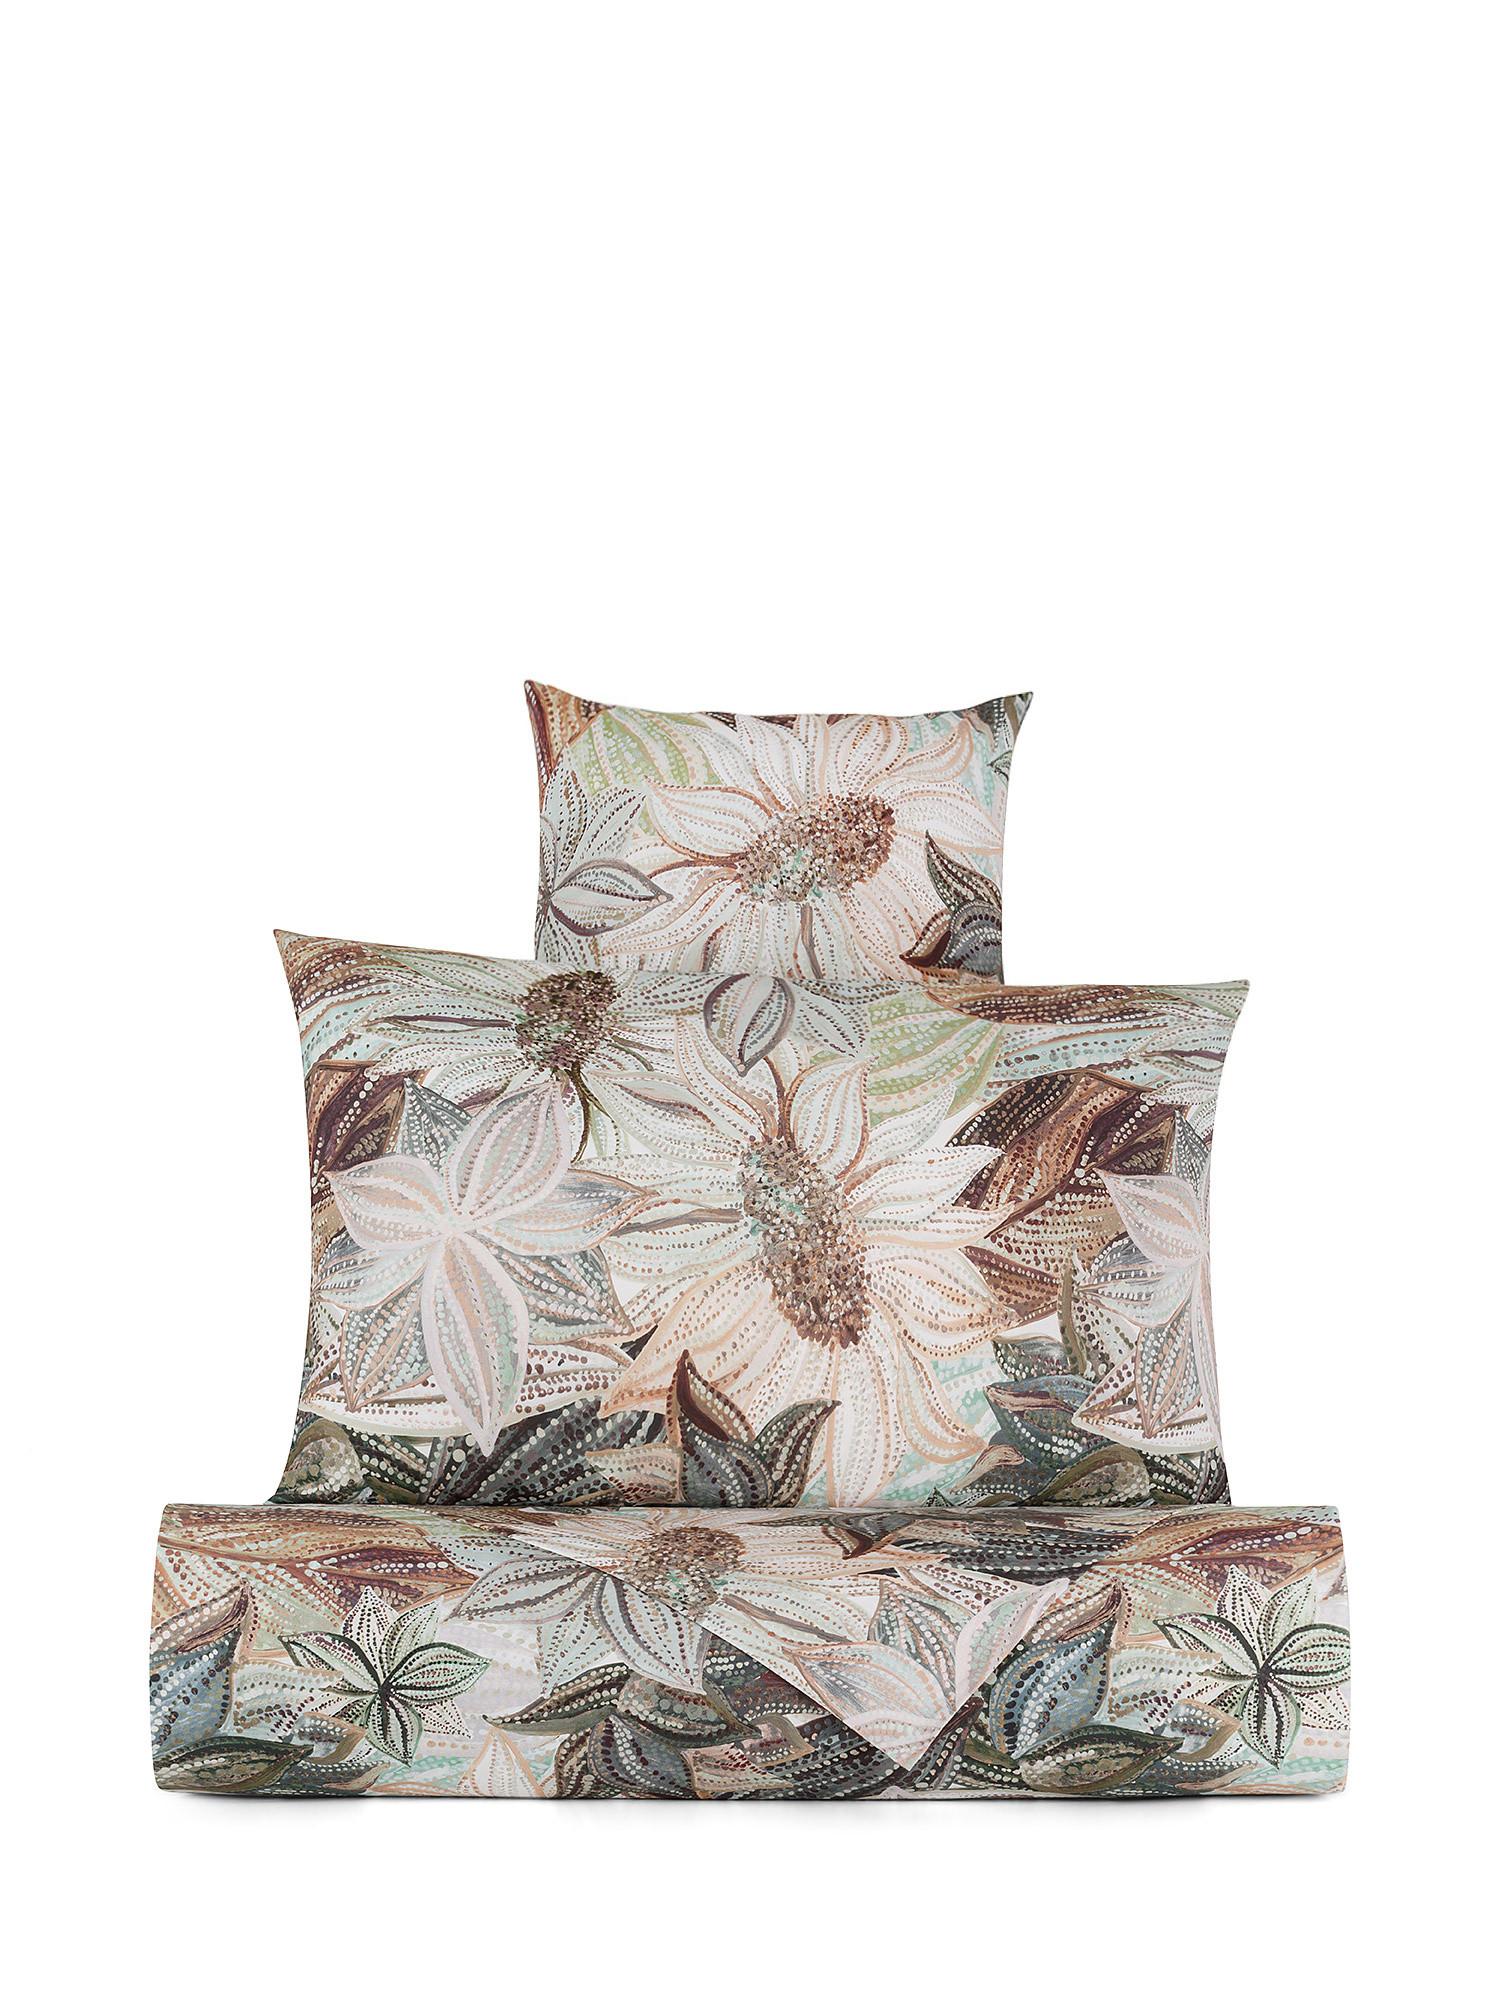 Lenzuolo liscio cotone percalle fantasia floreale, Verde, large image number 0